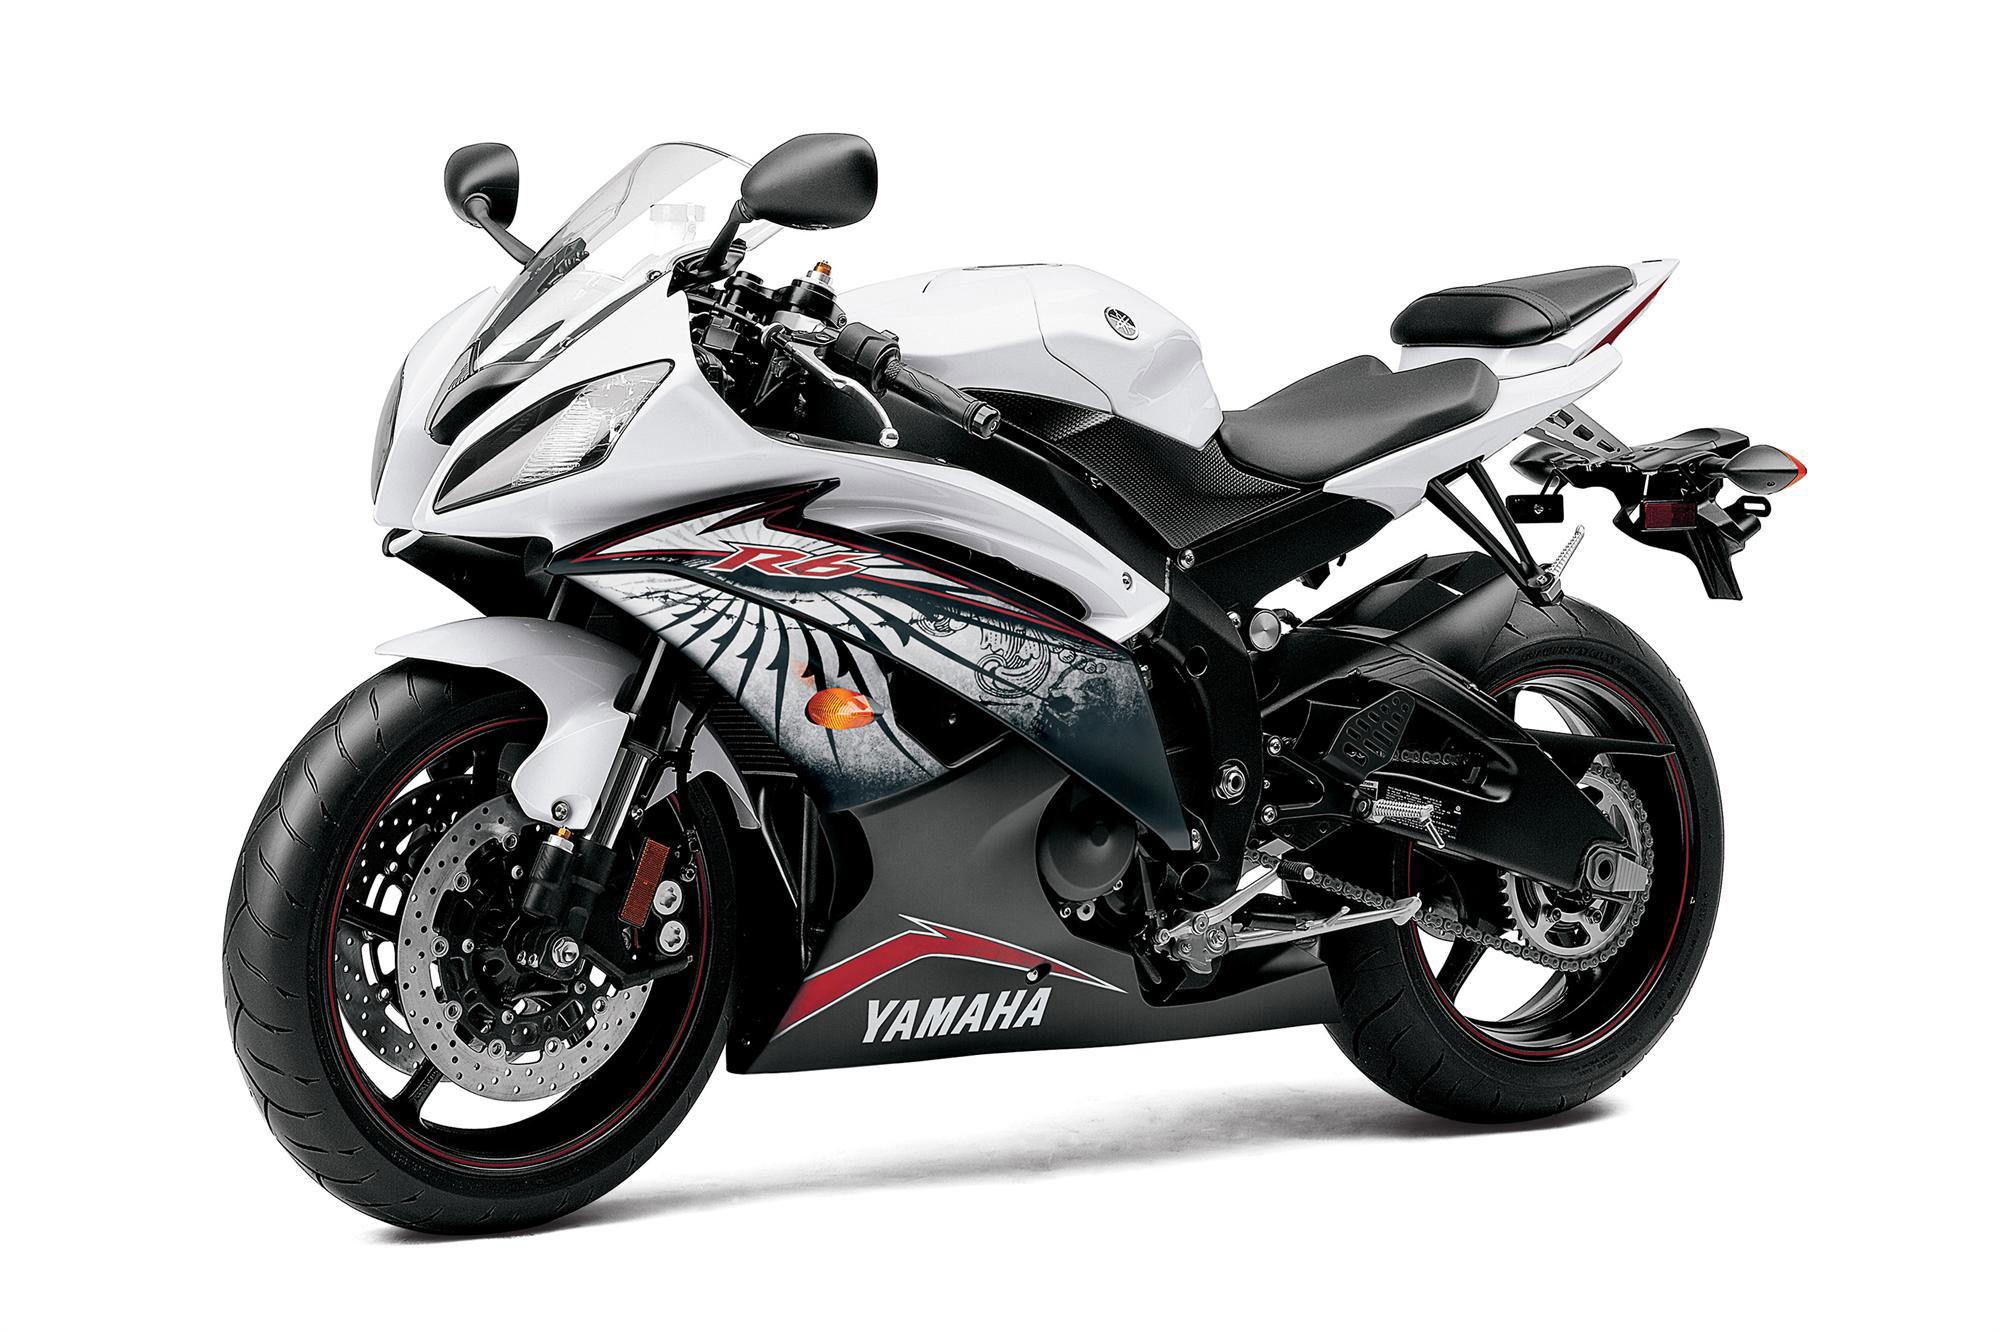 Yamaha Motorcycle YZF R6